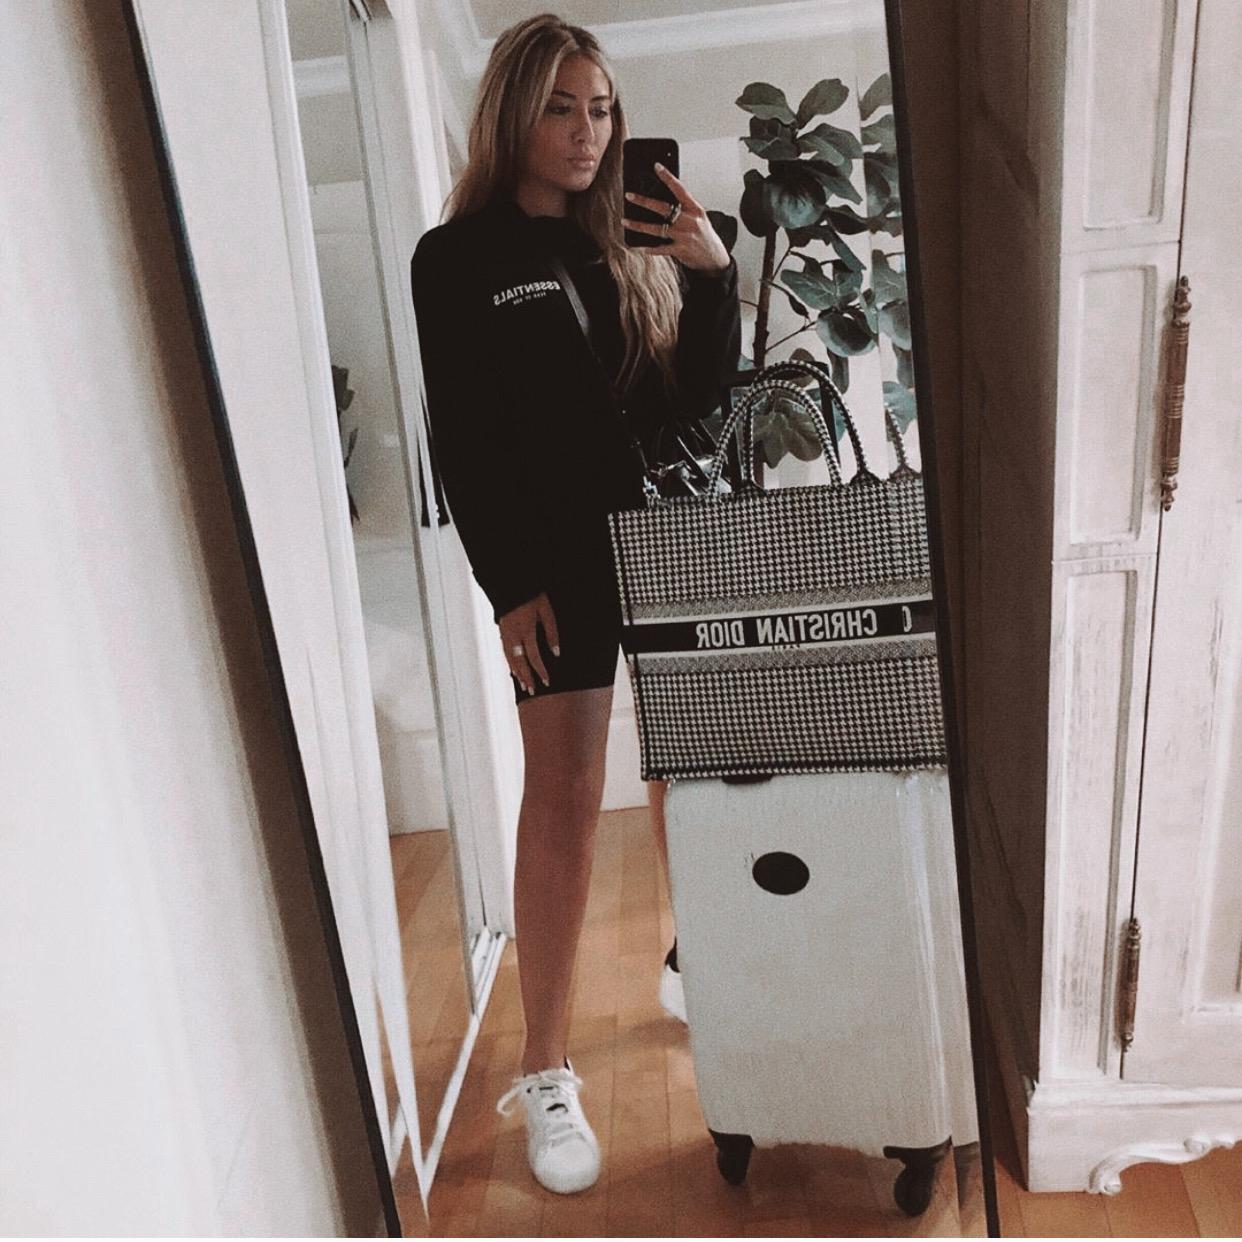 Woman wearing Lee Metal 40mm Multi-Time Zone Watch - IceLink